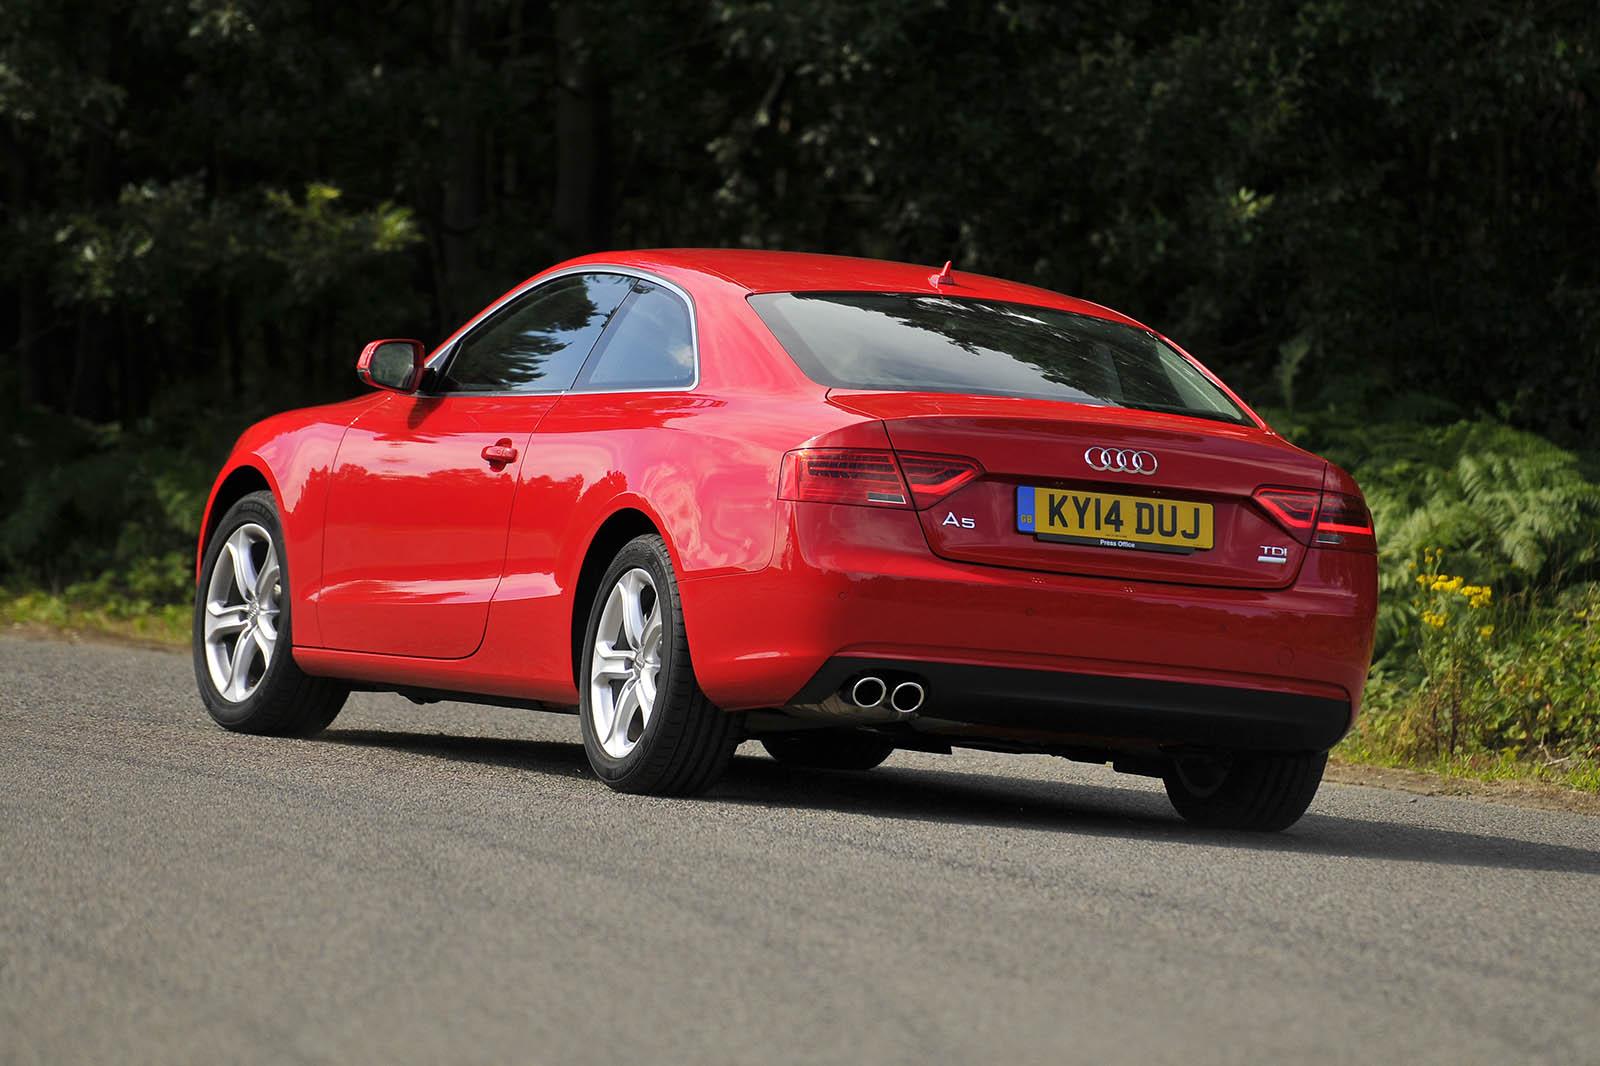 Kekurangan Audi A5 2007 Top Model Tahun Ini